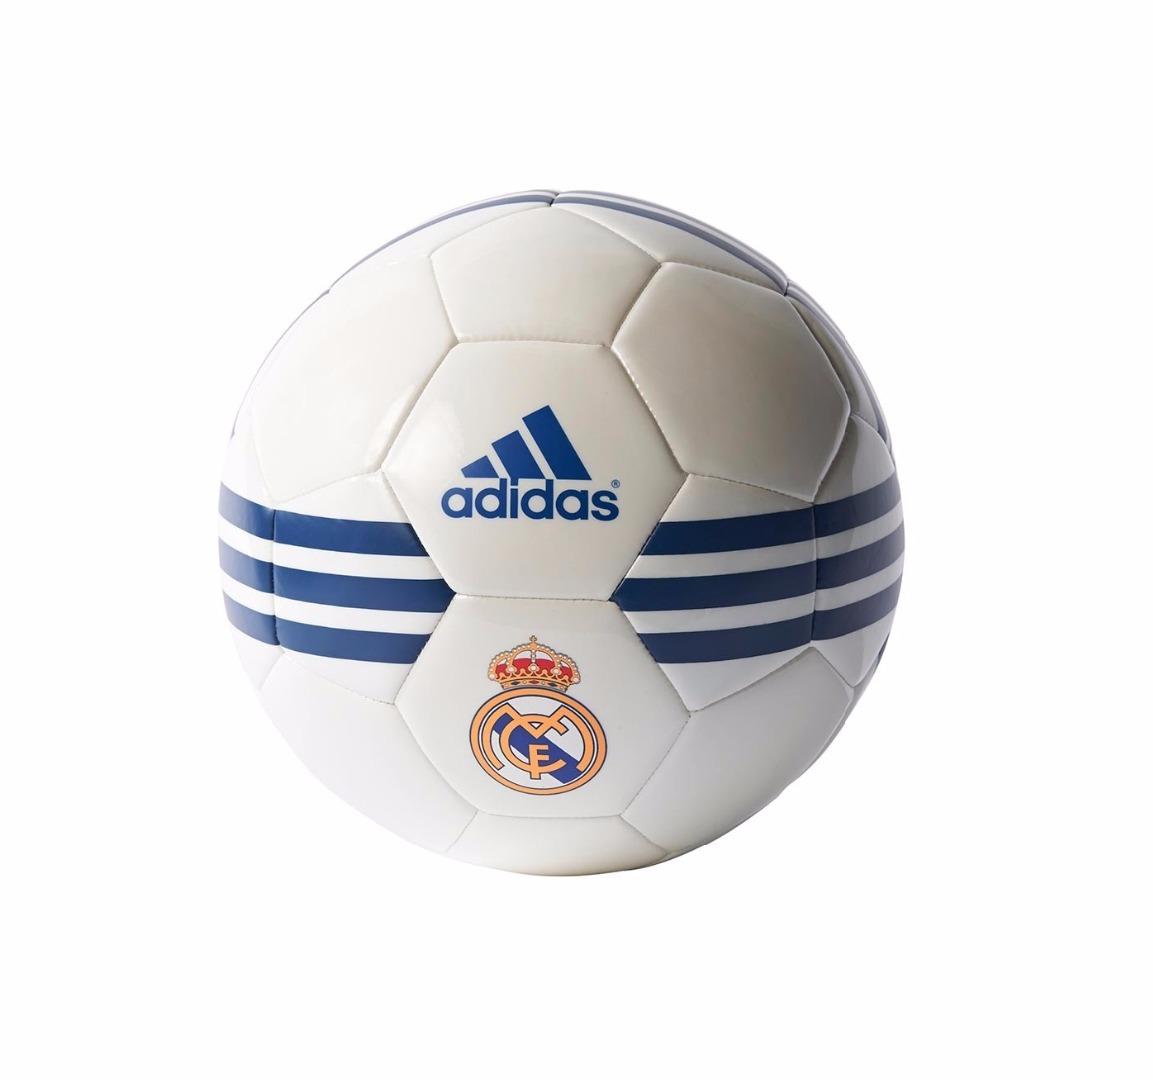 Мяч Adidas Real Madrid AP0487 c3549bfb78e4a